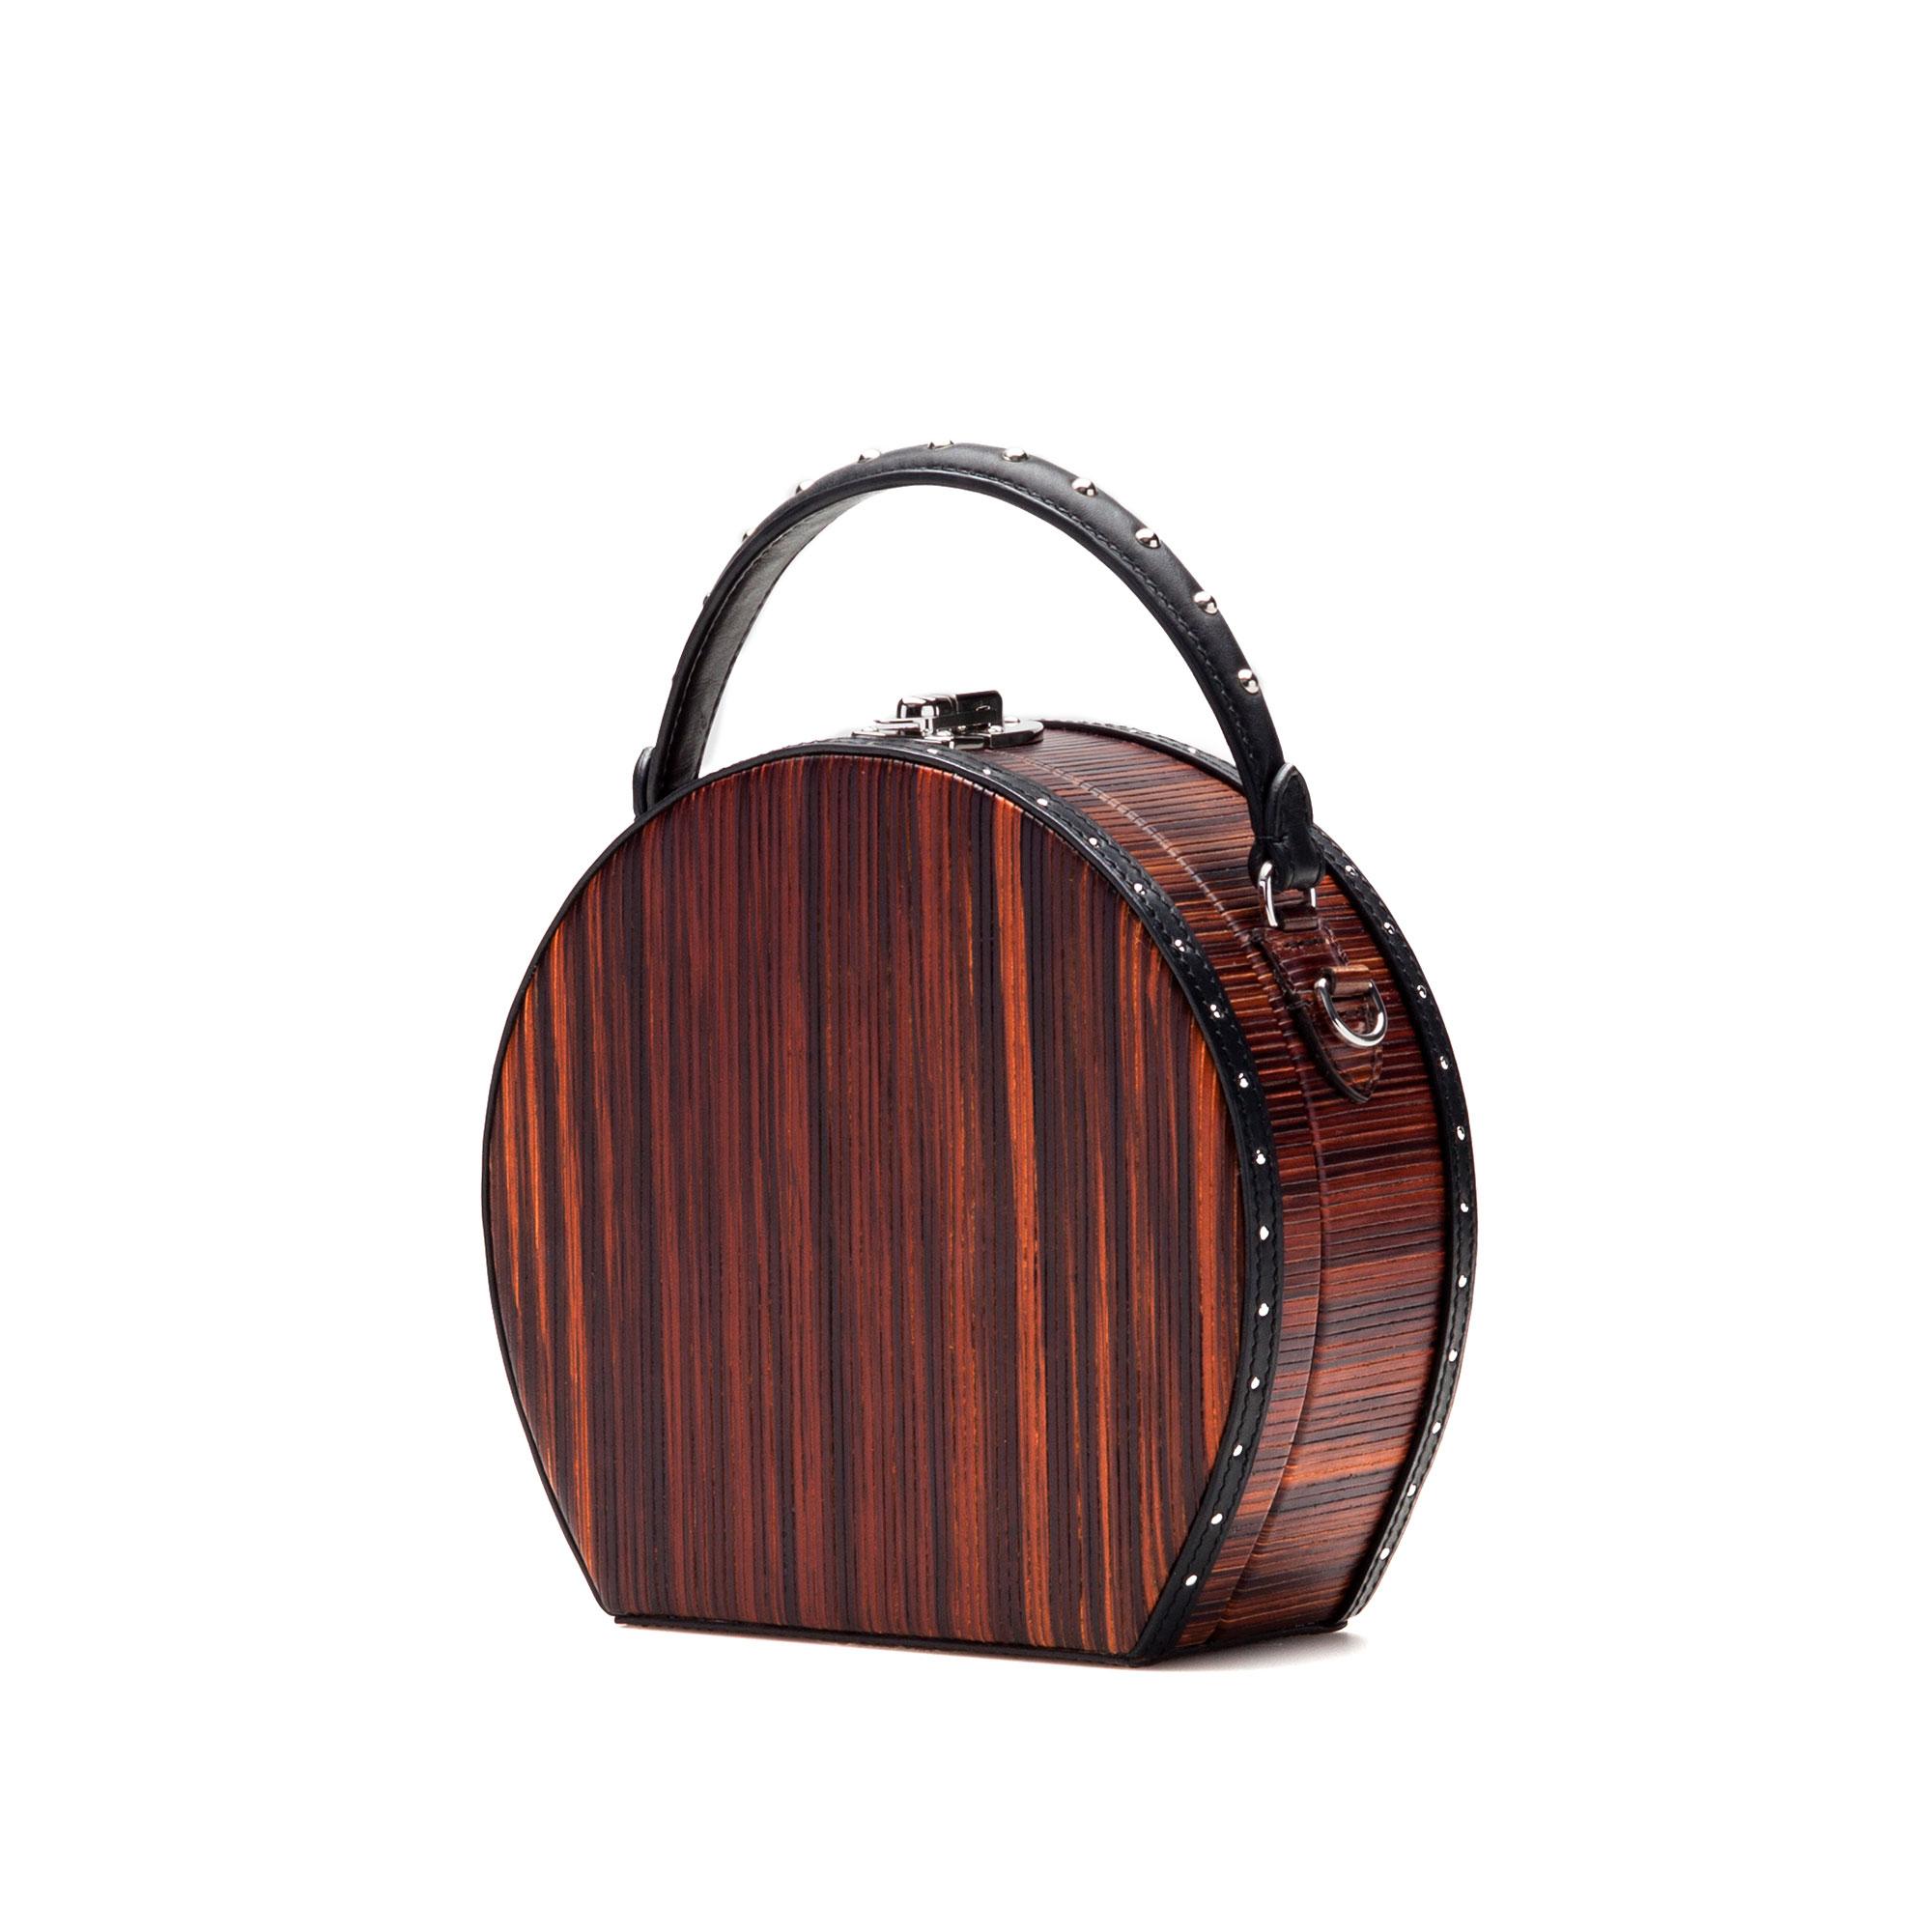 The wood effect french calf and wood leather Regular Bertoncina bag by Bertoni 1949 02